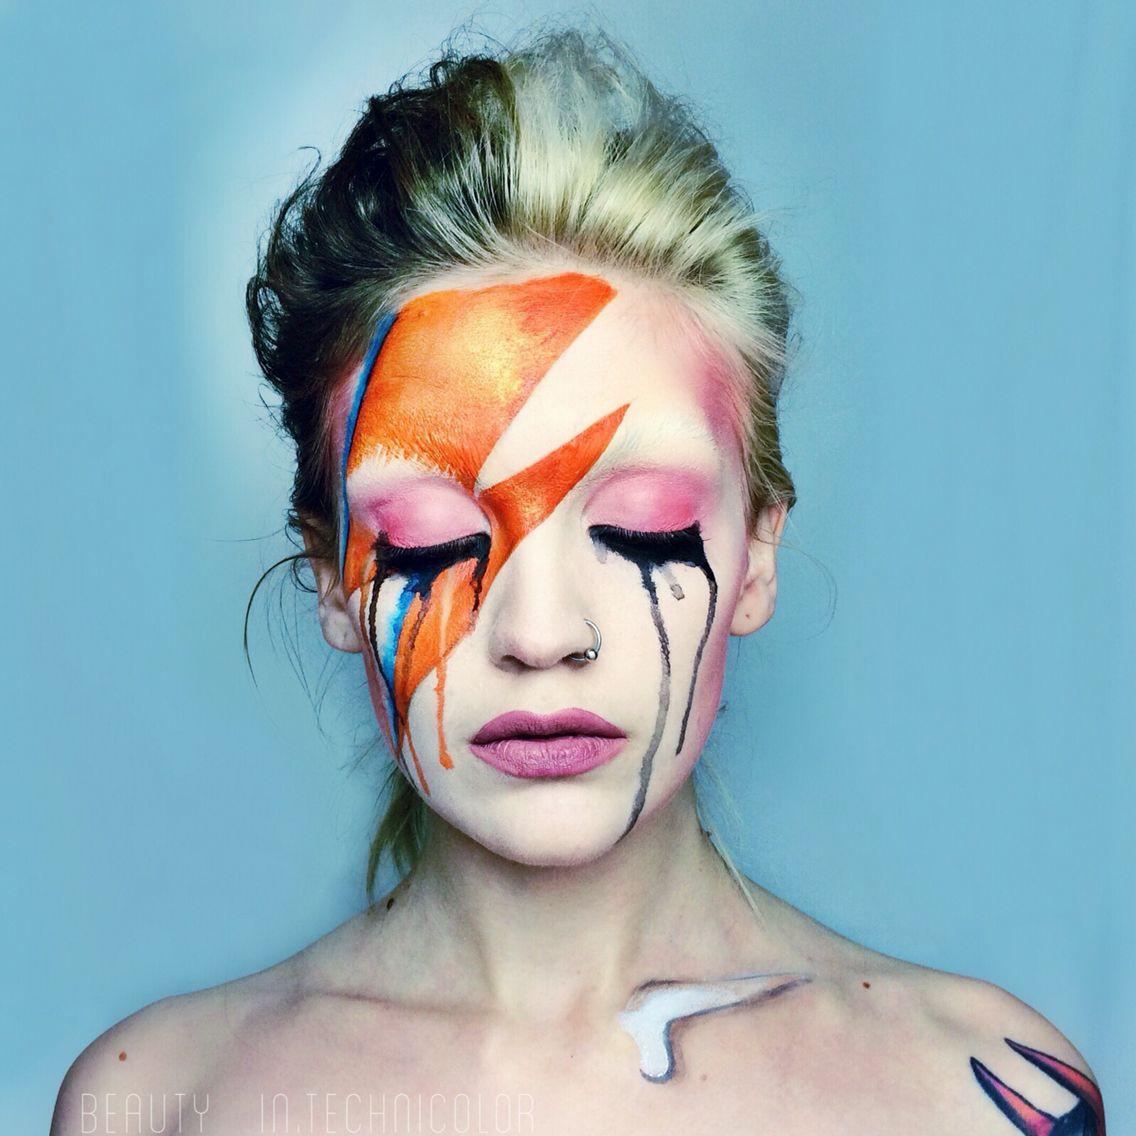 David Bowie tribute by Haley Mariah Tuesday. Aladdin sane, Ziggy stardust makeup. Crying makeup #halloween #makeup